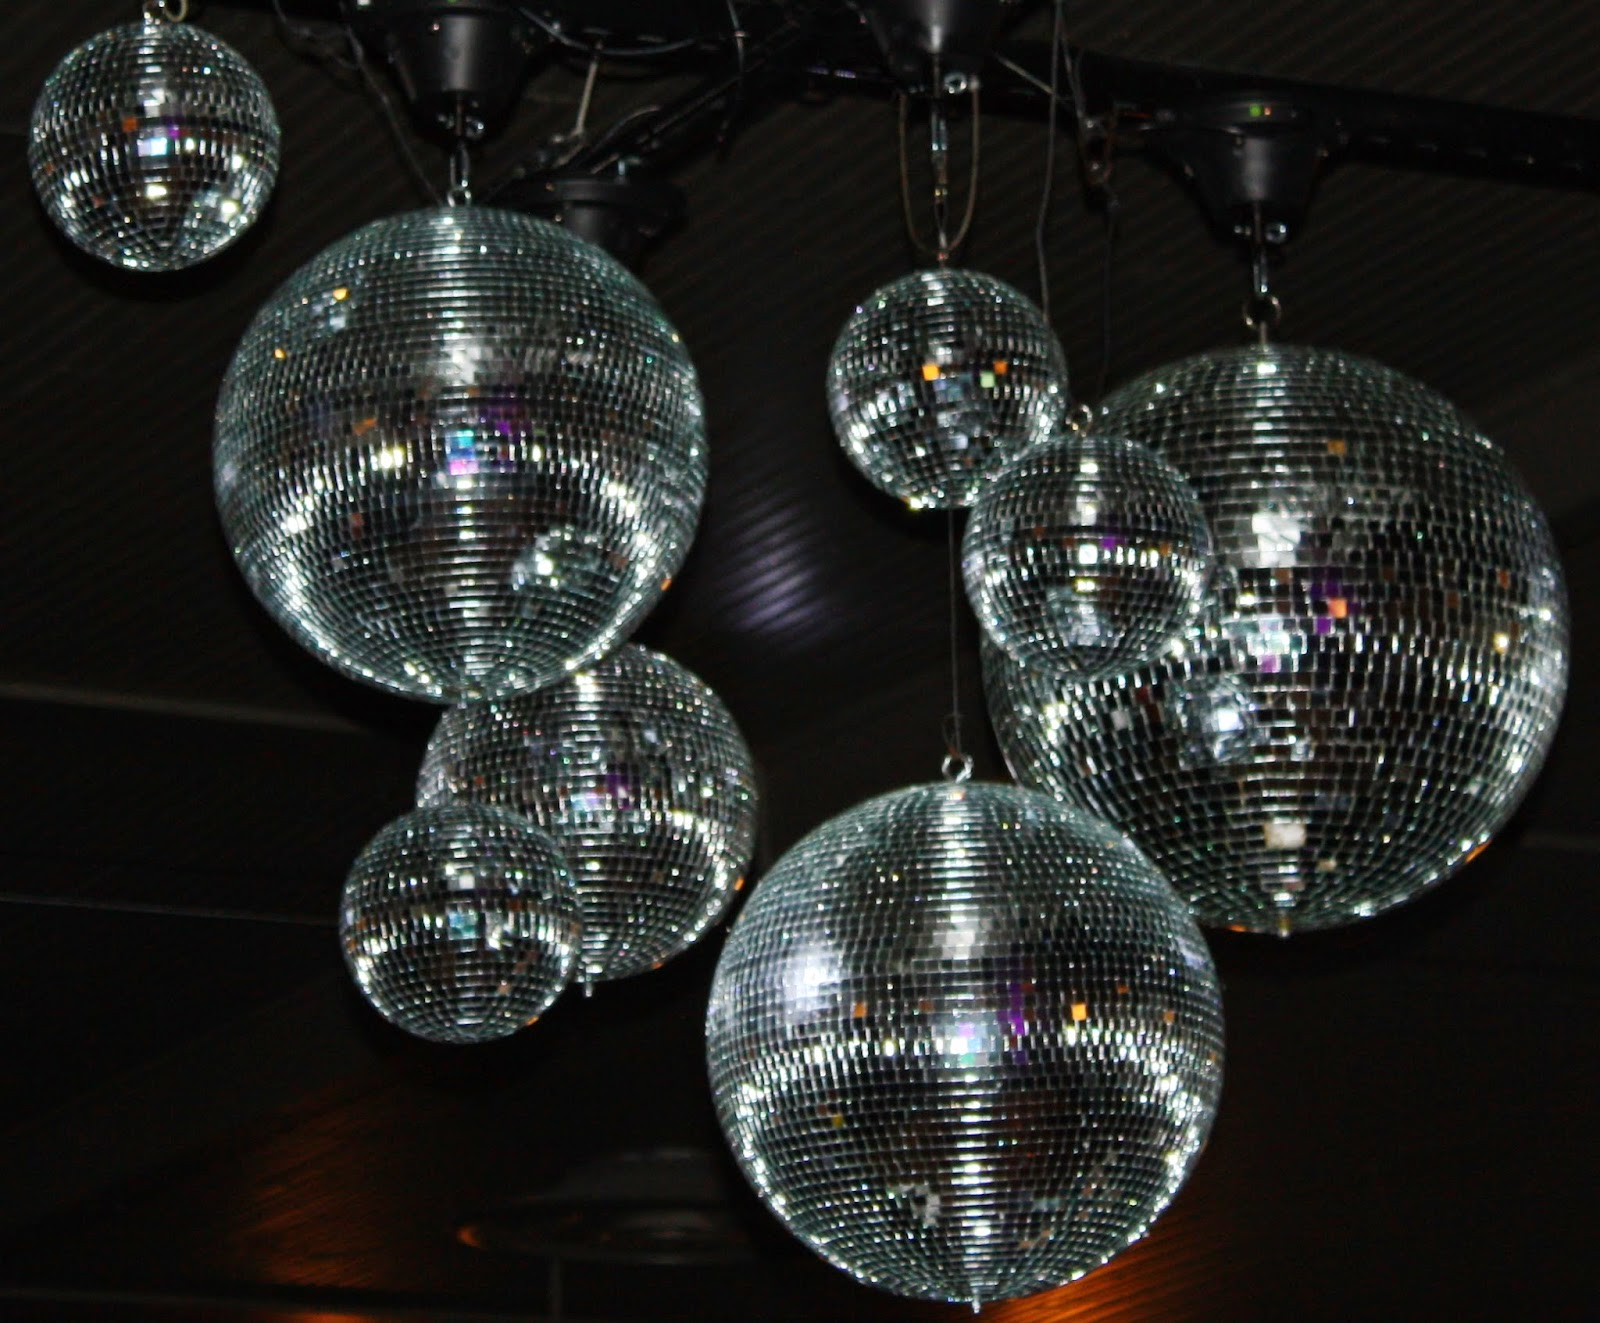 Chandelier Tree Leggett Mendocino County Source Disco Ball Light Fixture Choice Image Home Fixtures Decoration Ideas